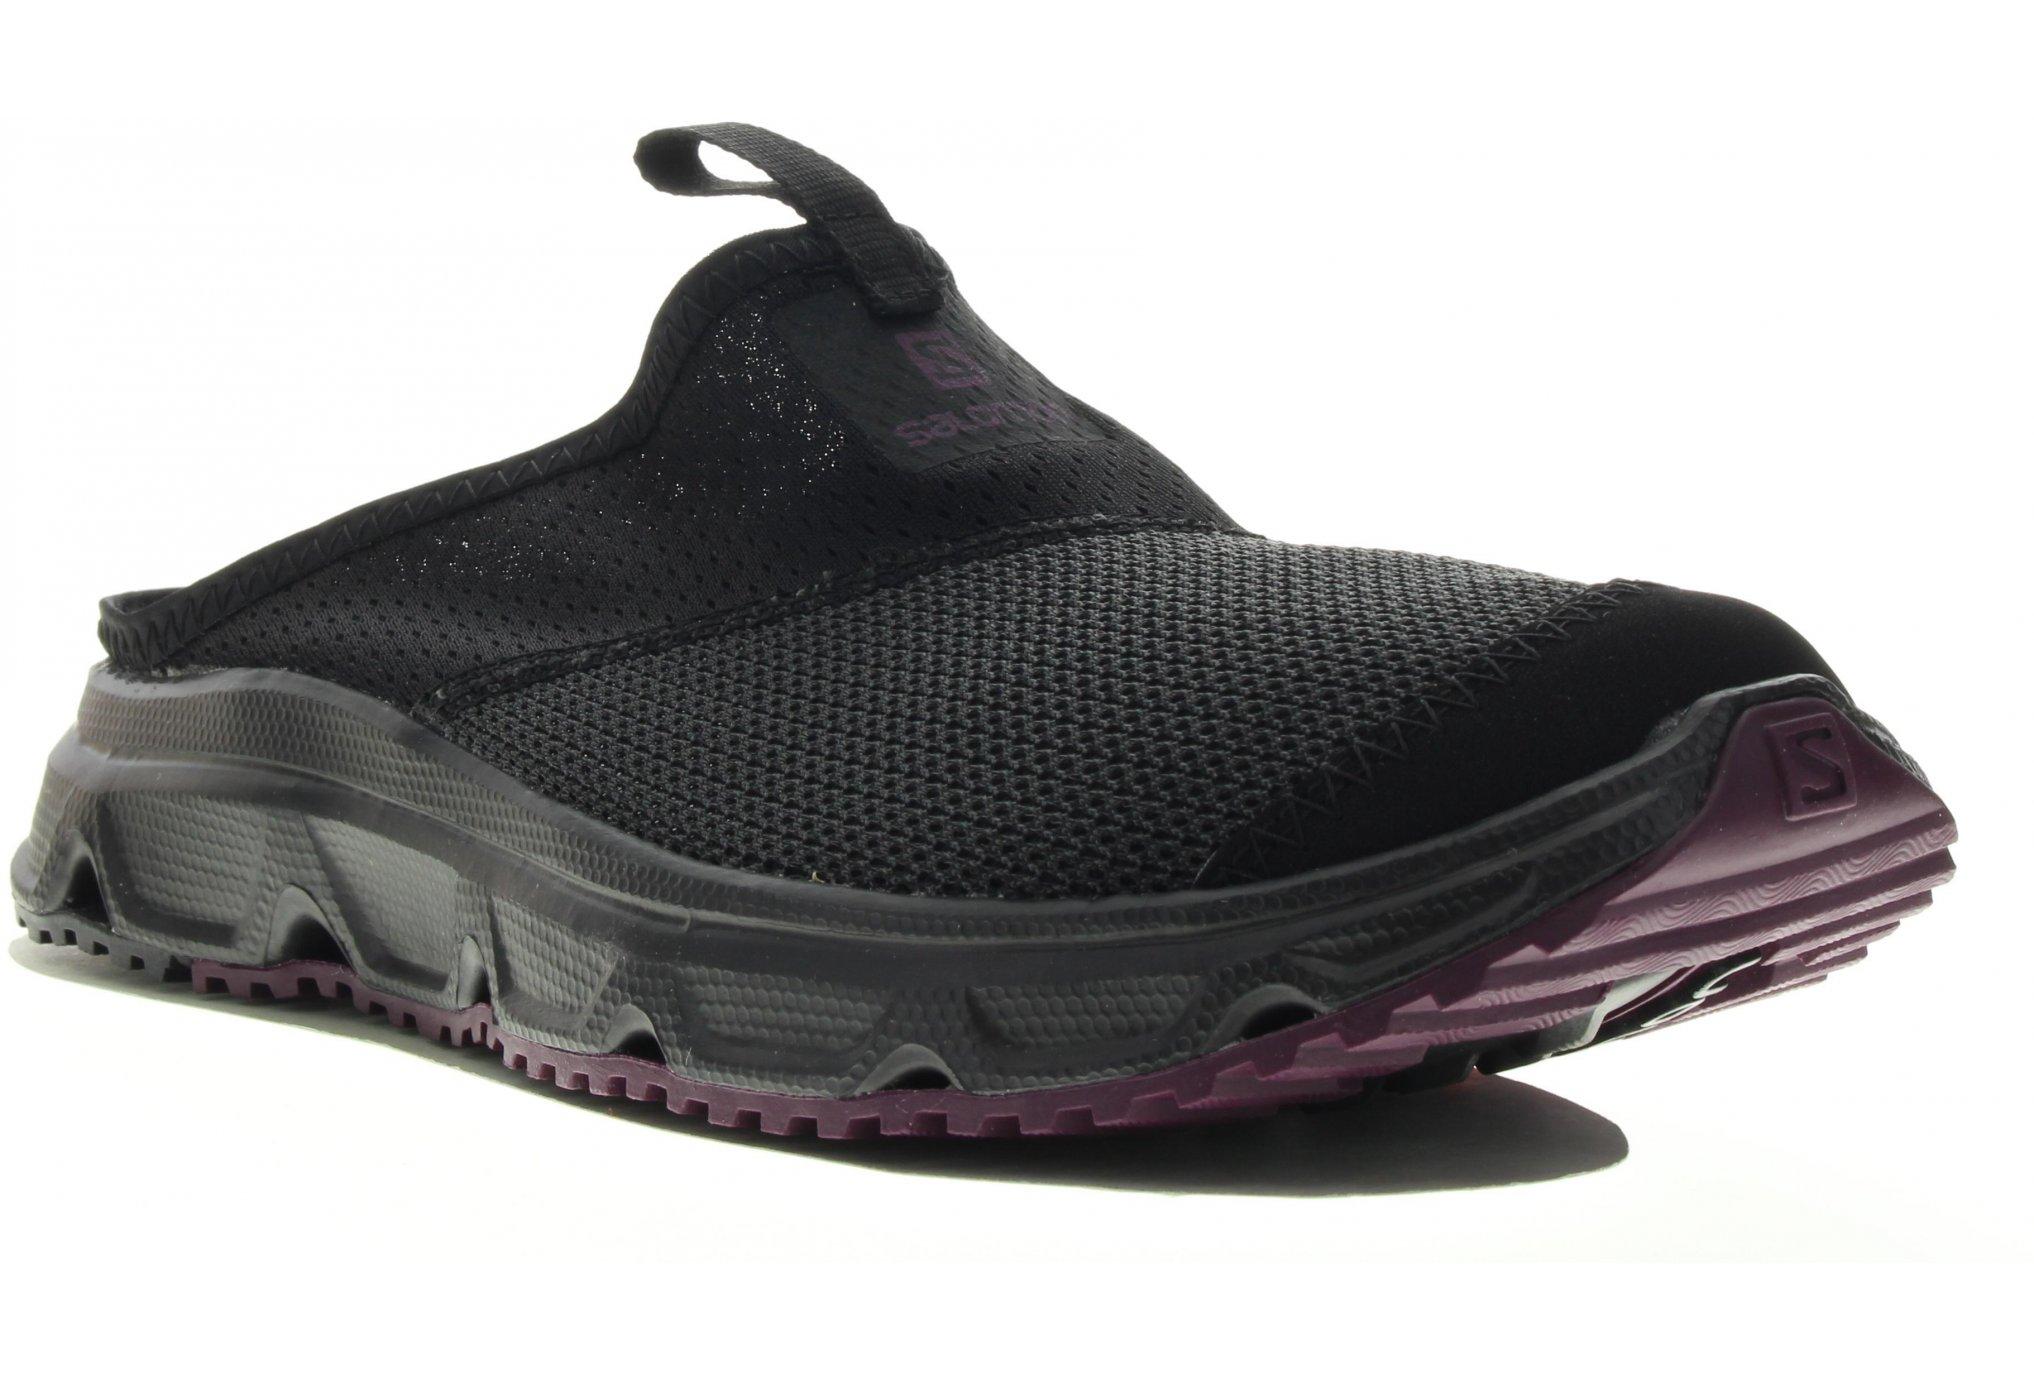 Trail Session Salomon RX Break 4.0 W Chaussures running femme